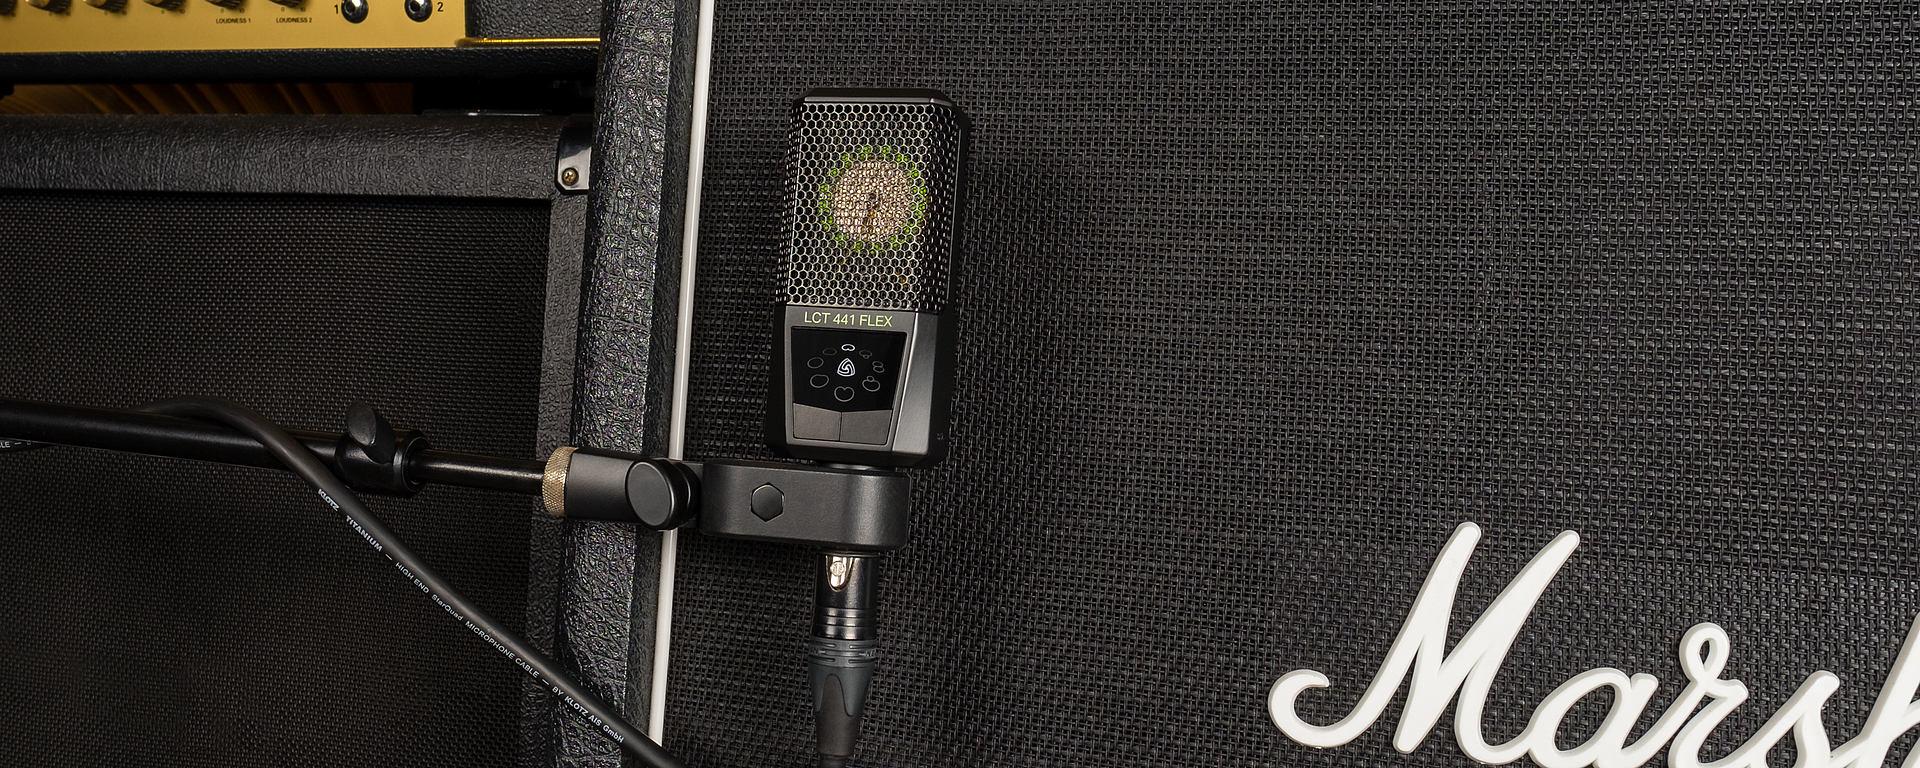 LCT 441 FLEX guitar cabinet amplifier